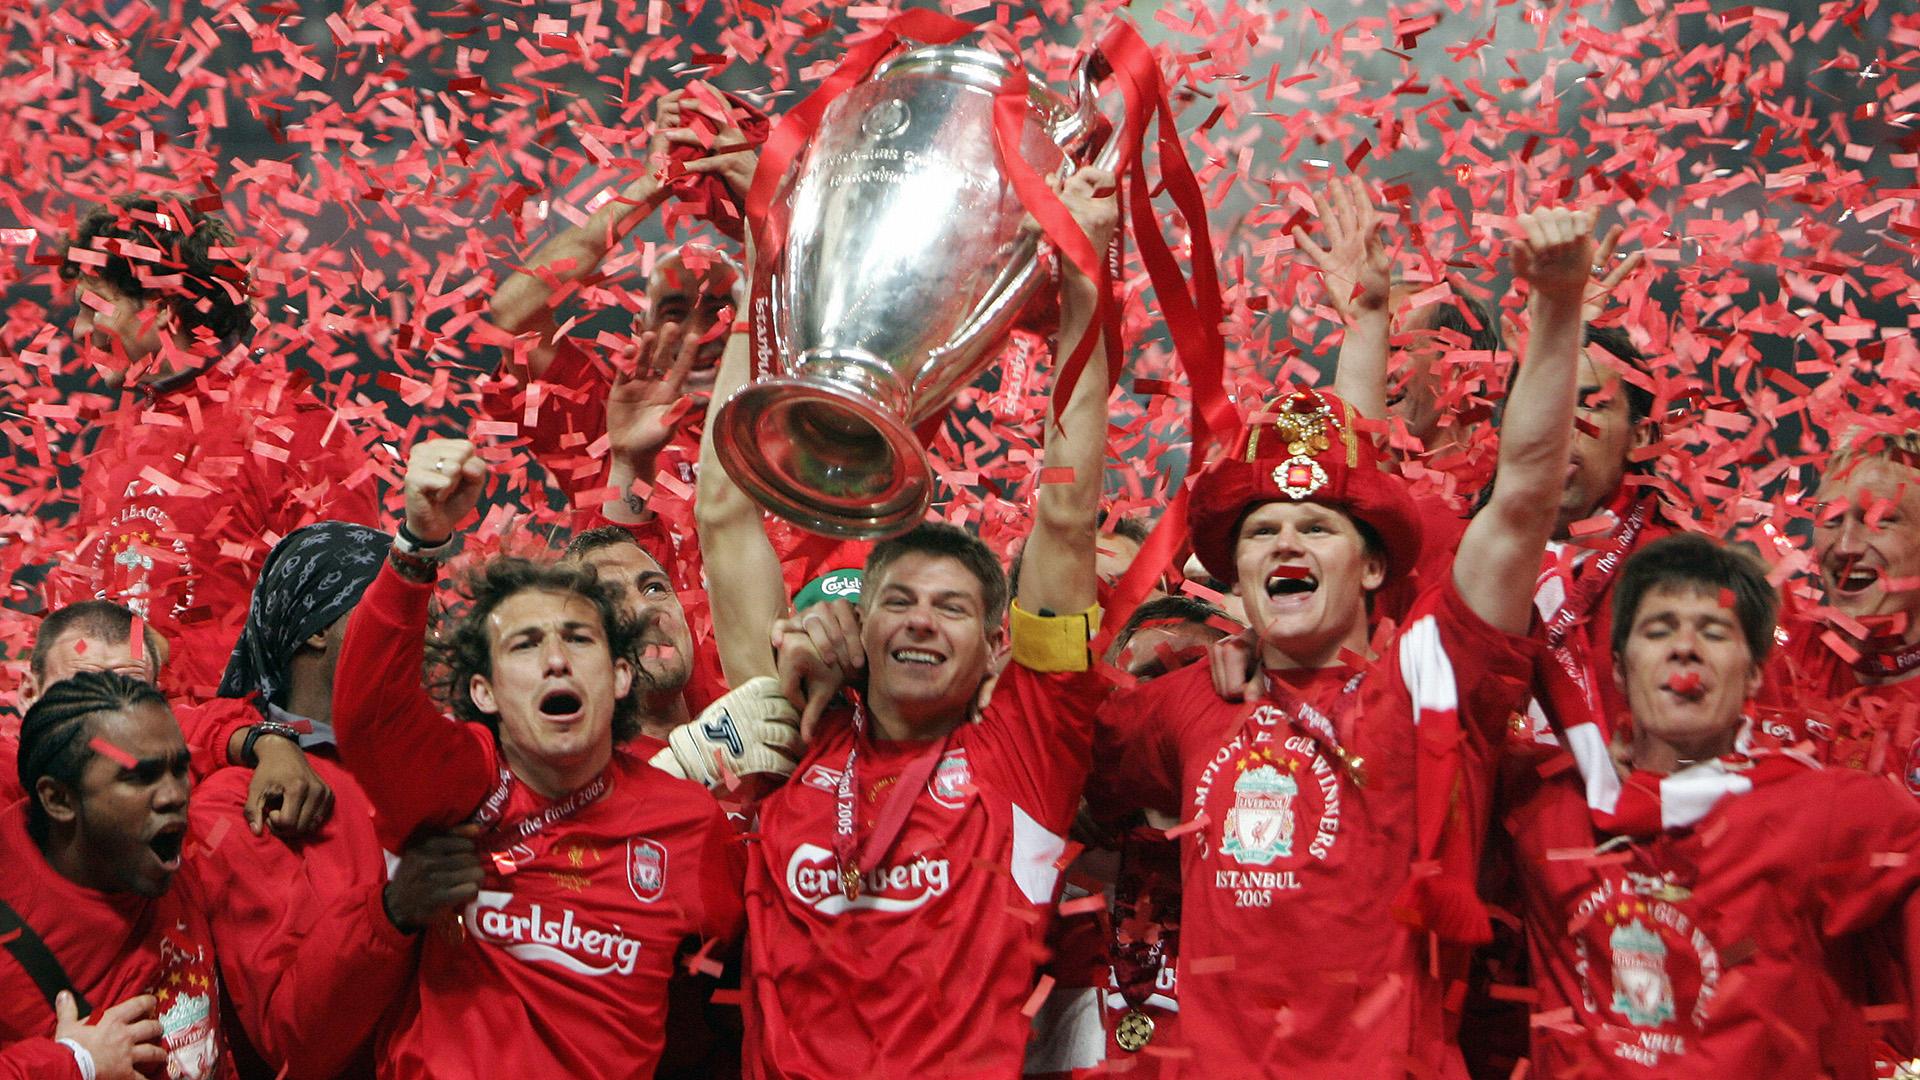 2005 Milan Liverpool Gerrard Goal Com